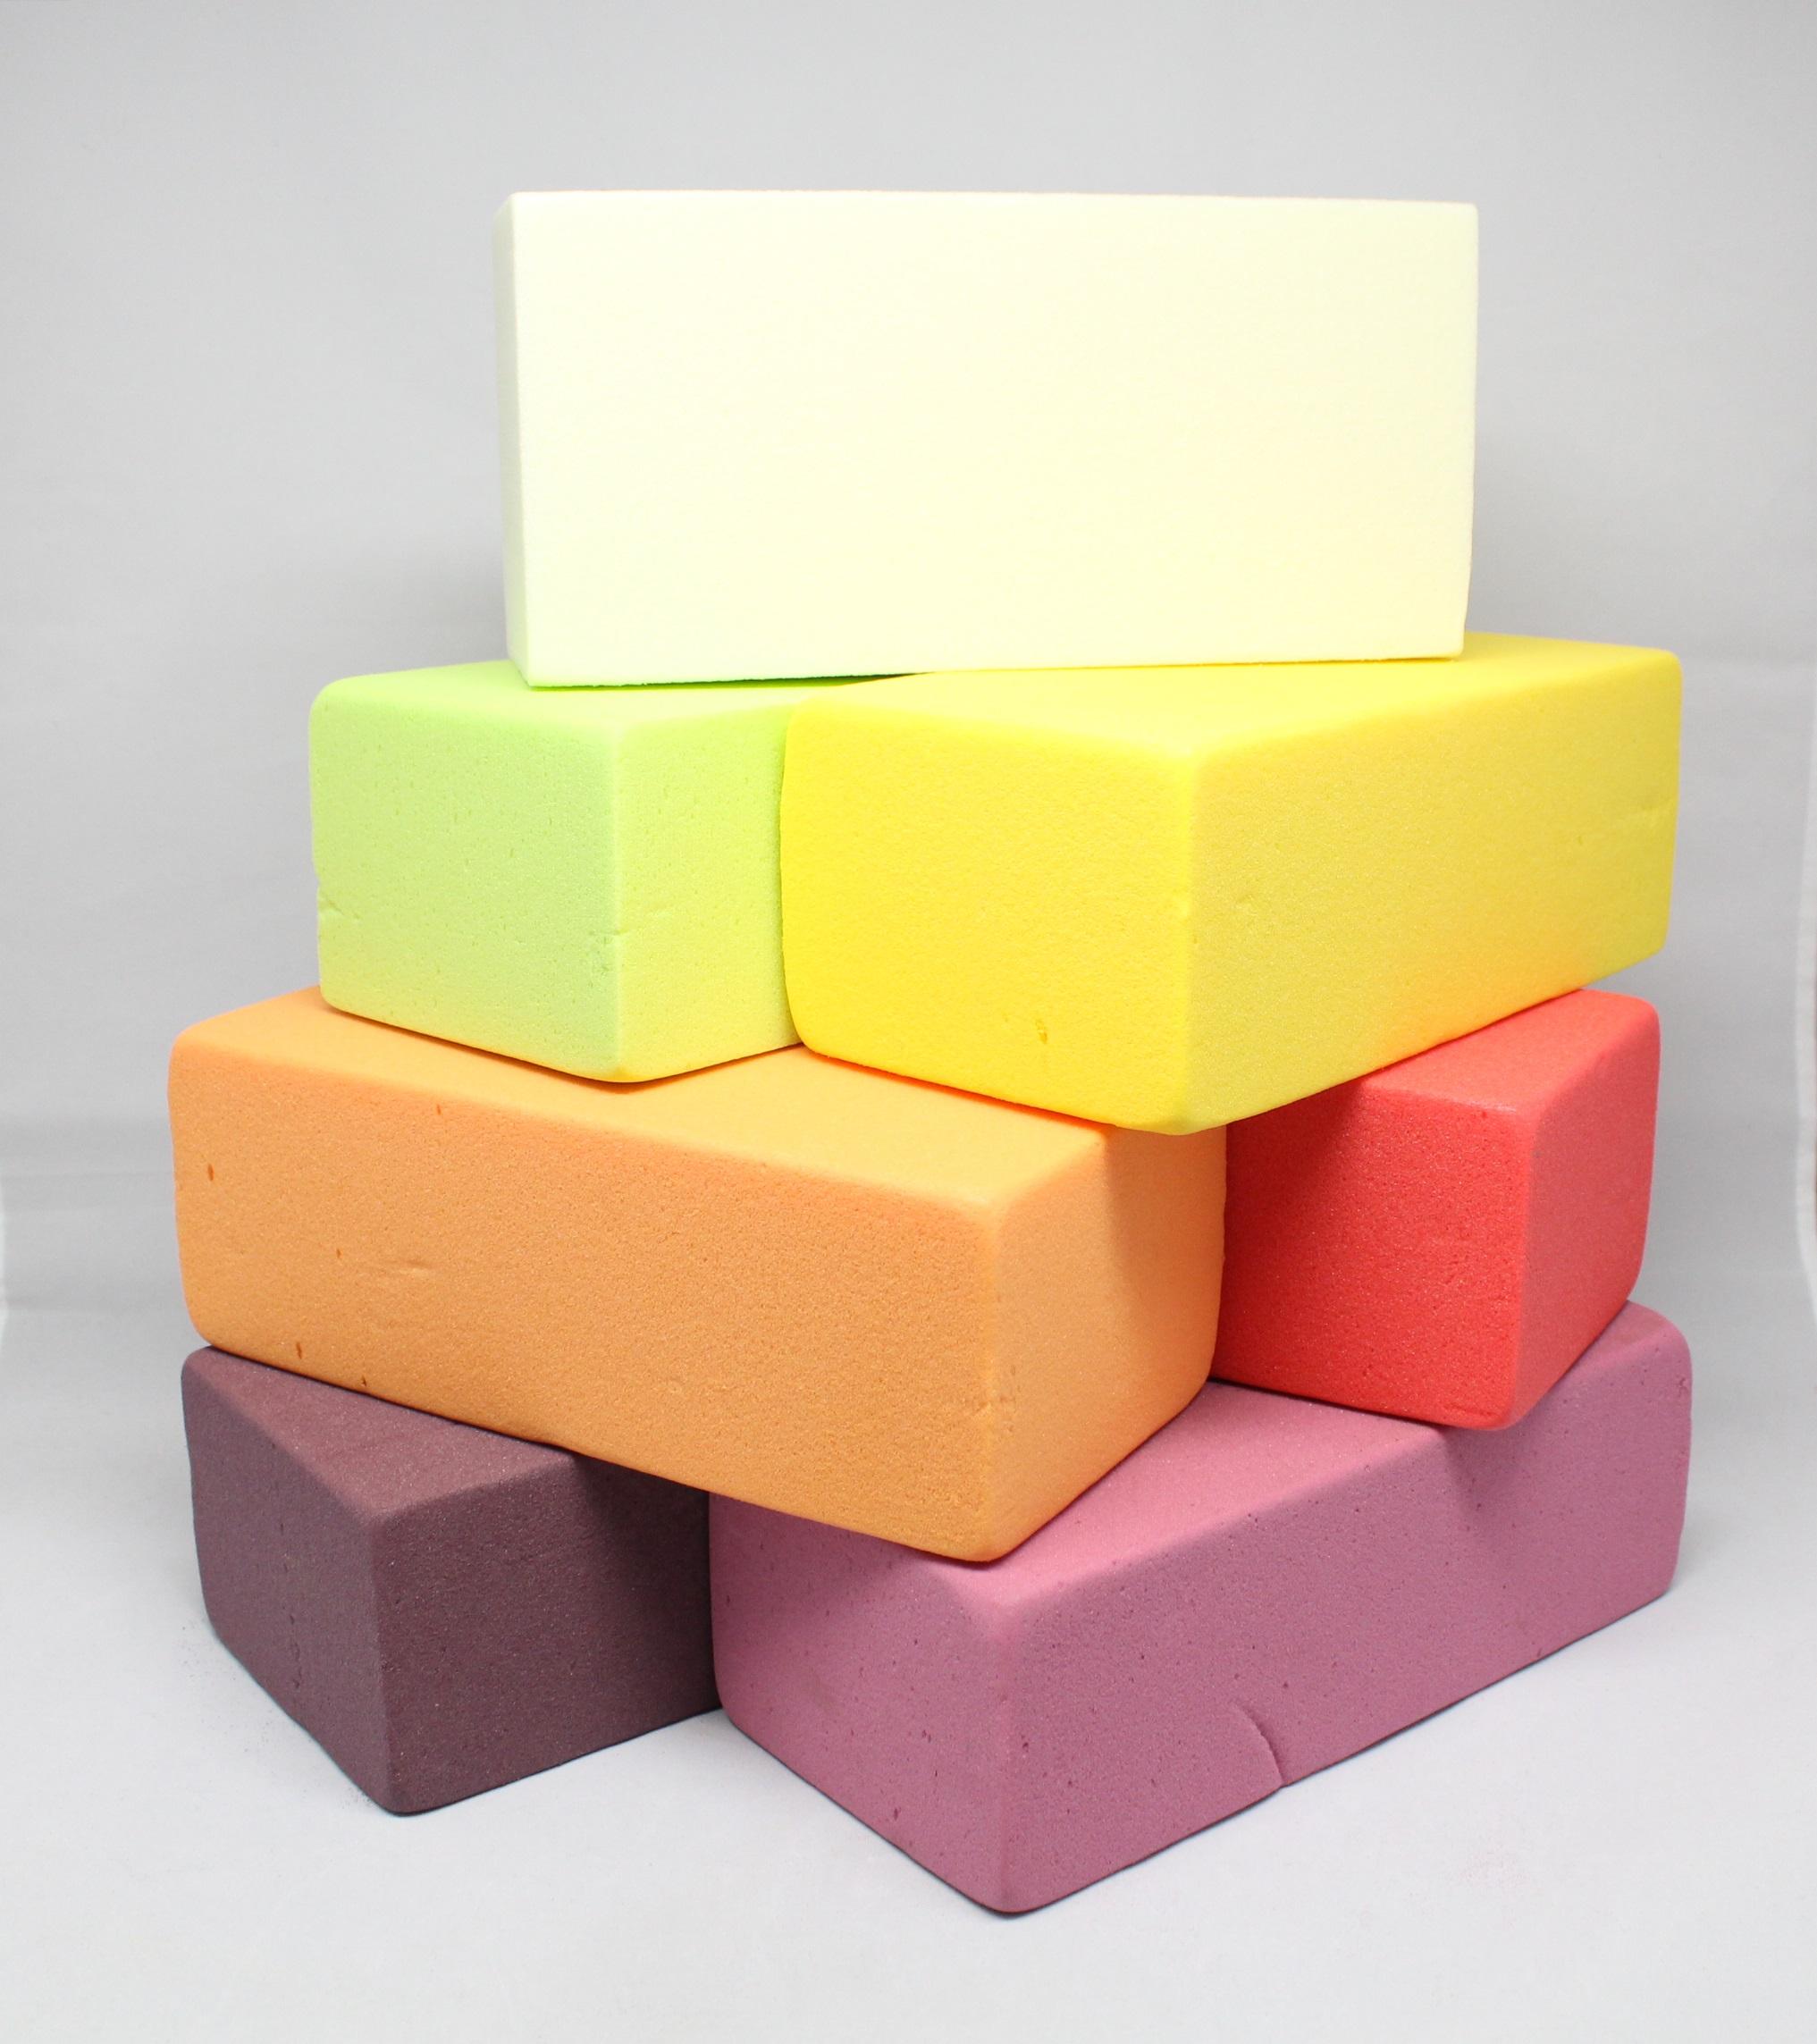 Aranžovací hmota barevná 23x11x8 cm Barva: Žlutá